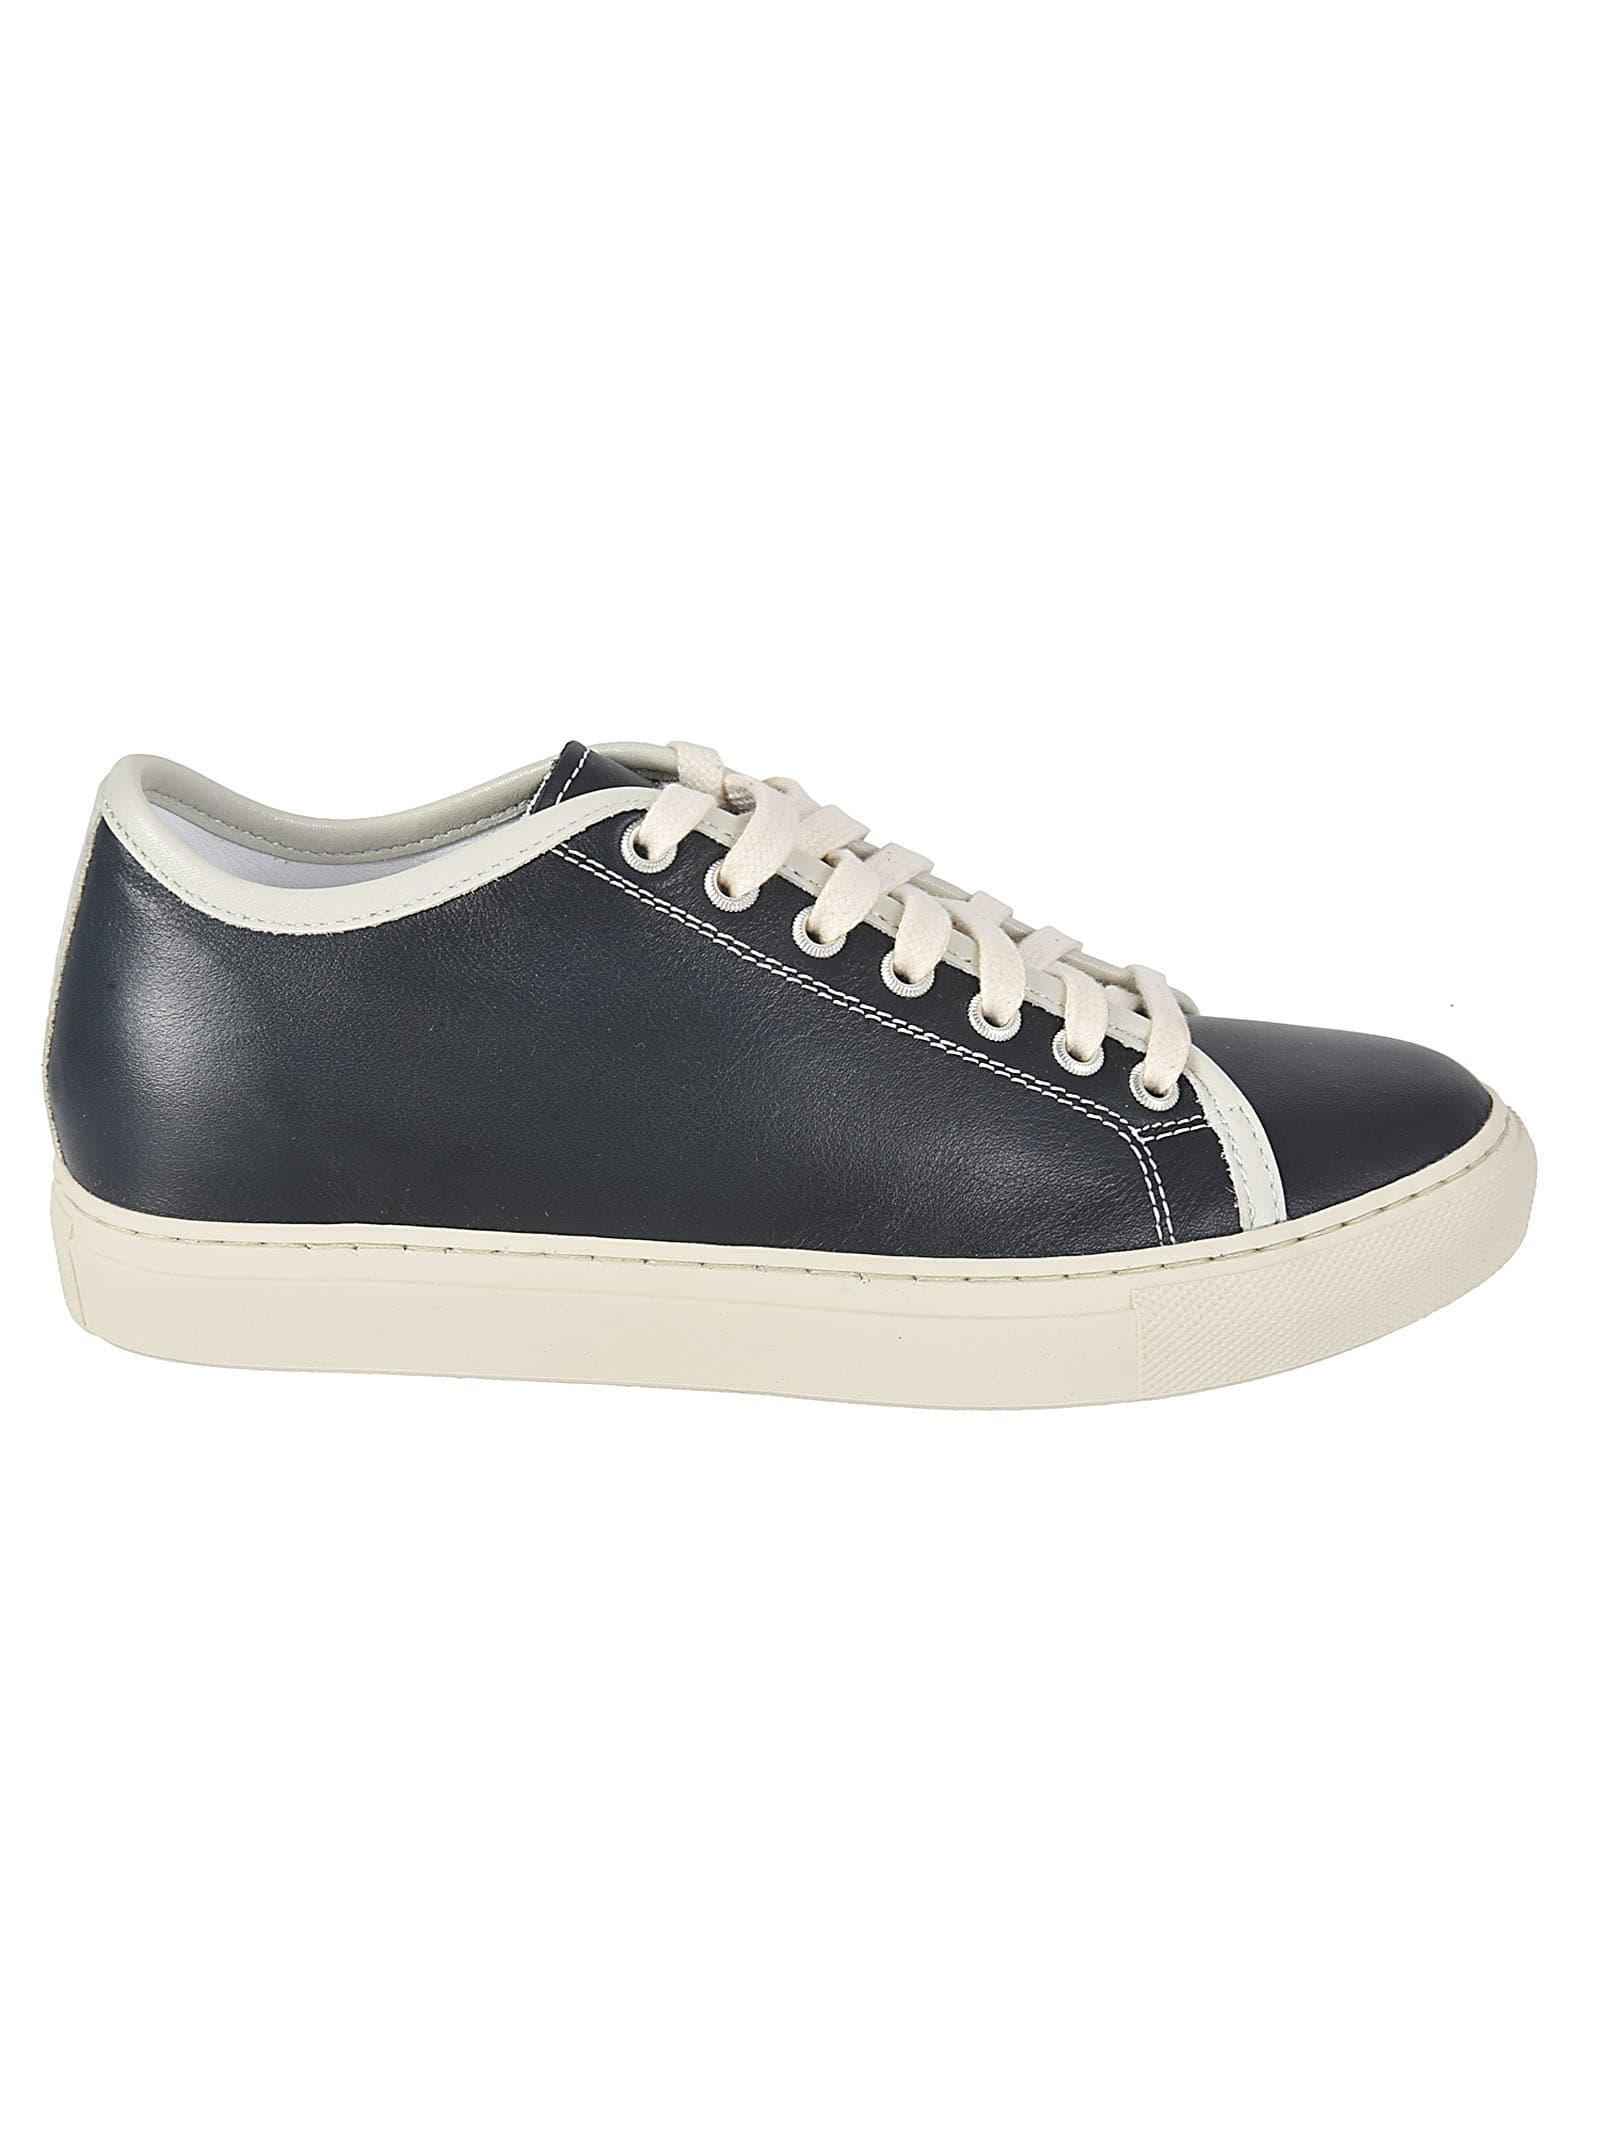 Sofie dHoore Color-block Sneakers